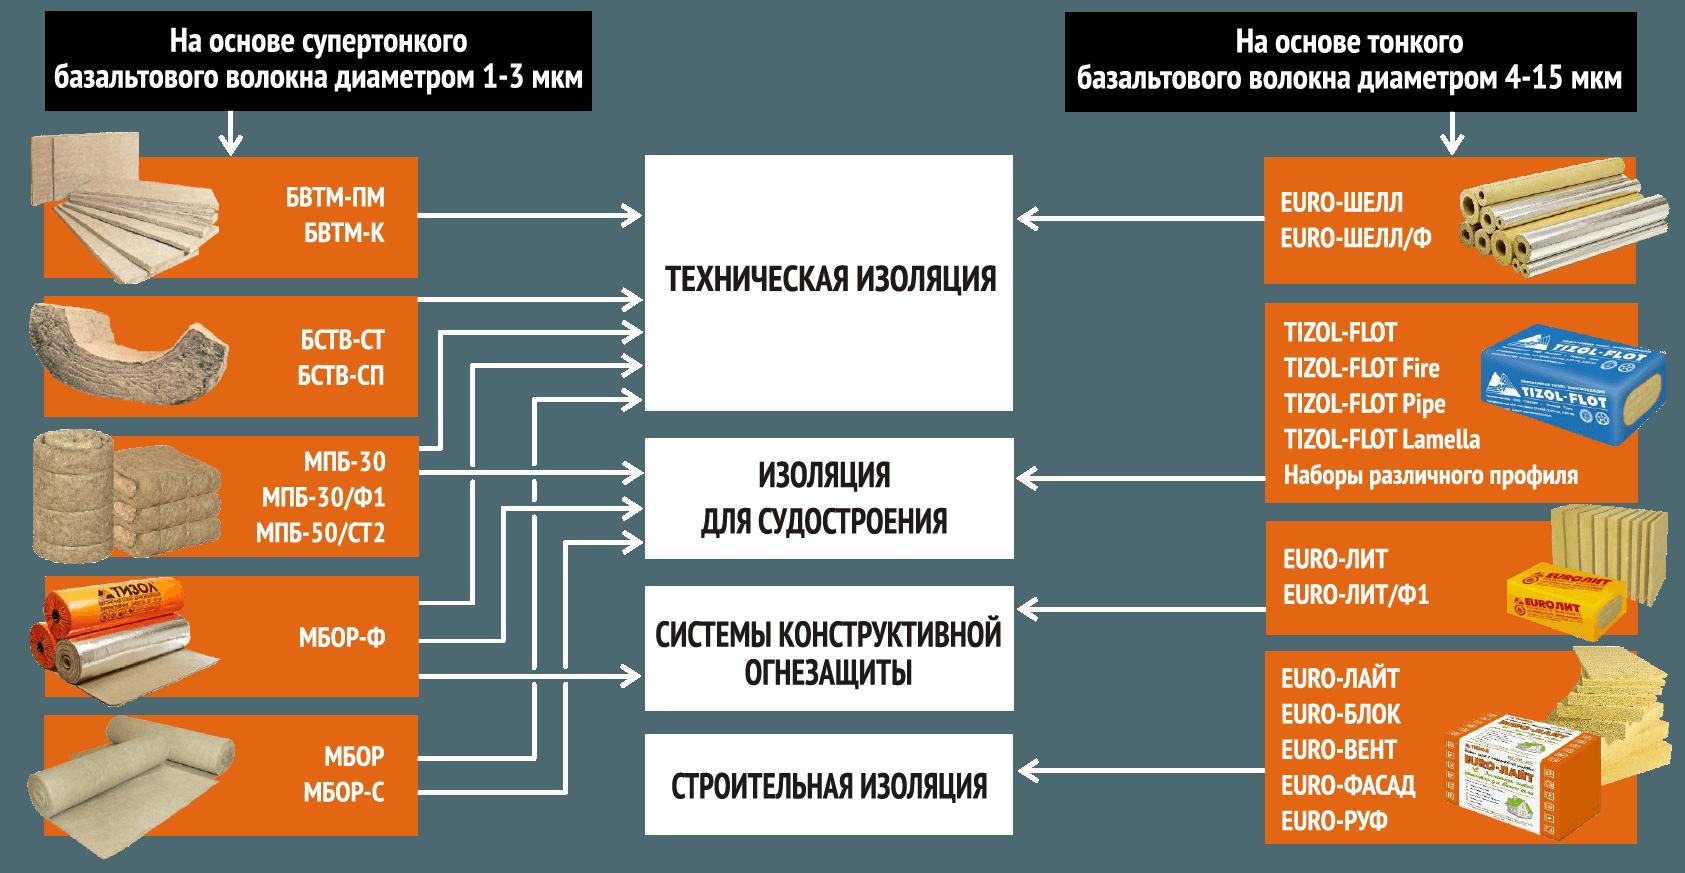 продукция тизол бишкек tizol